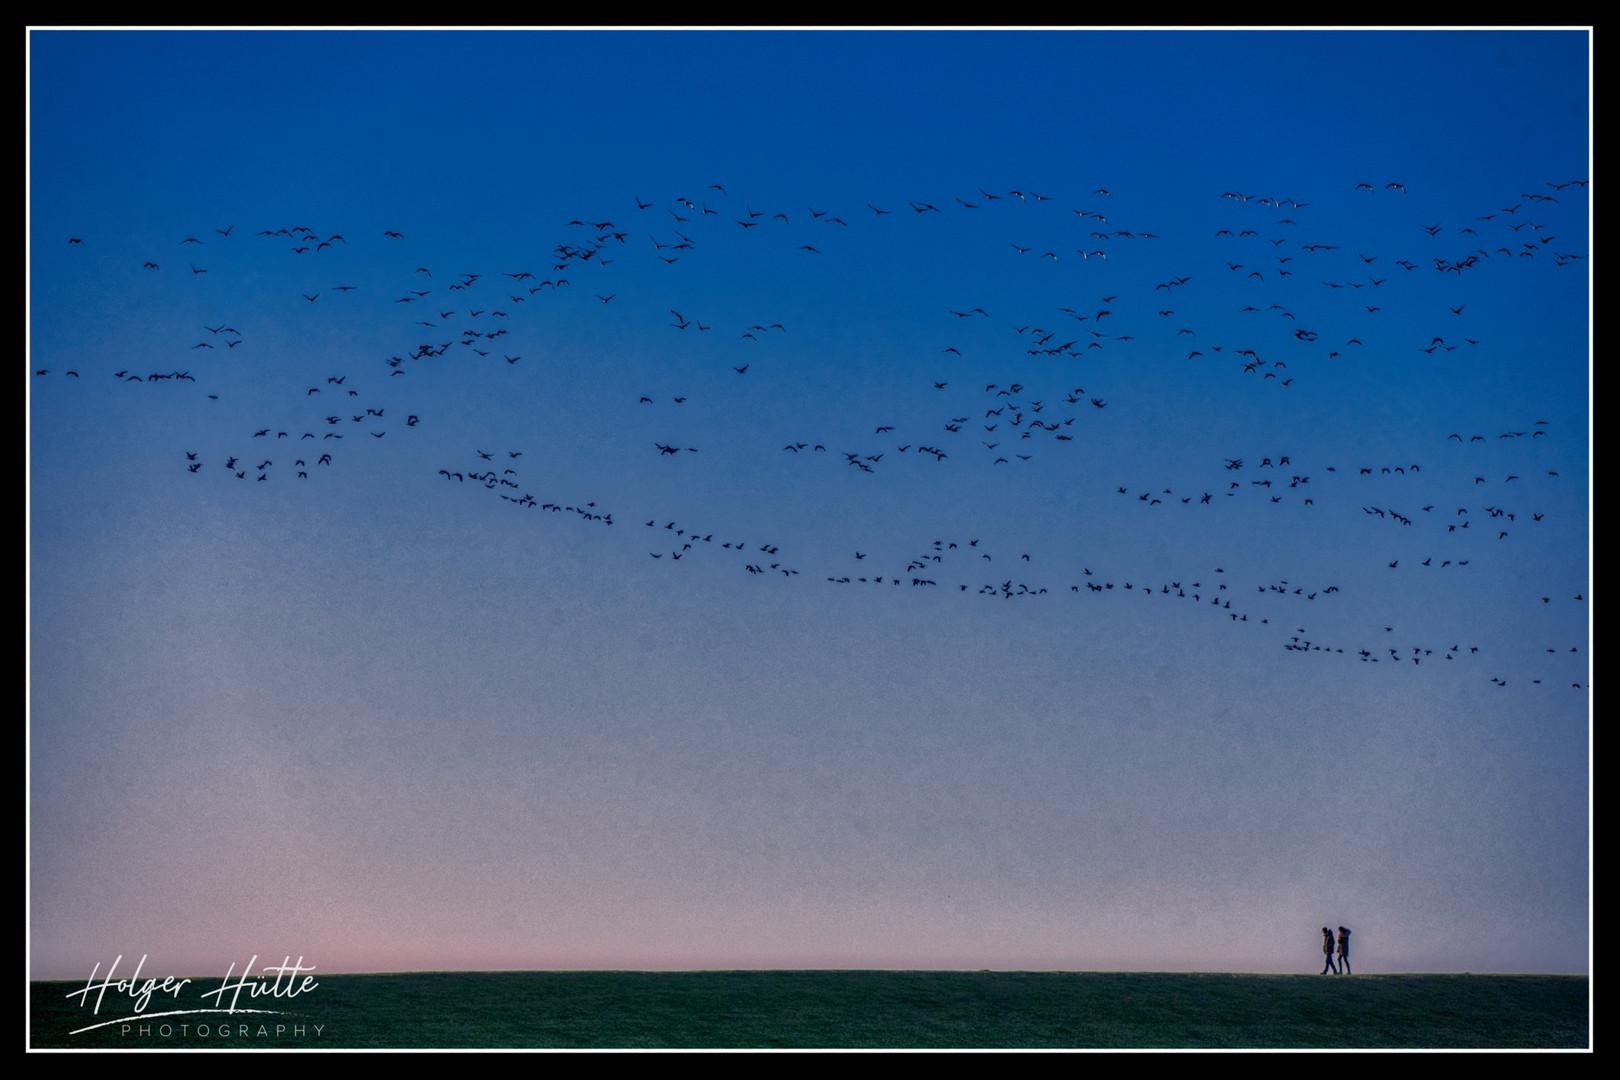 Zugvögel - Herbst an der Nordsee